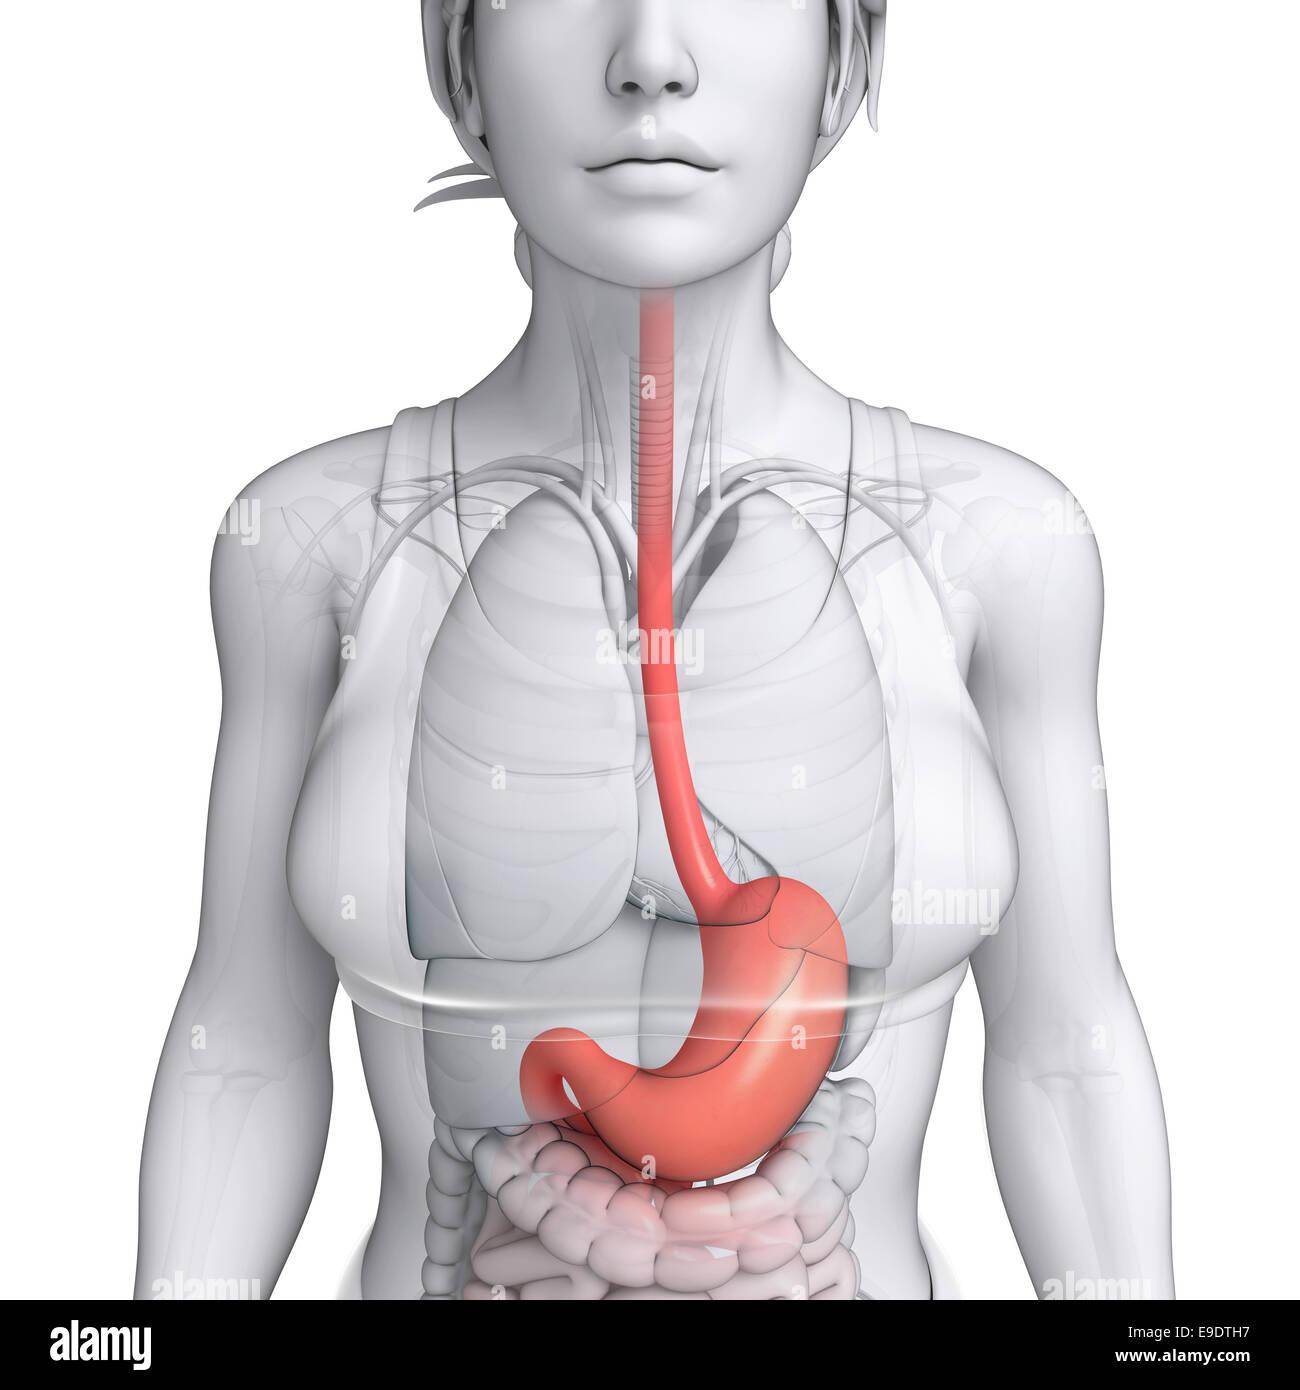 Illustration Of Female Stomach Anatomy Stock Photo 74678051 Alamy